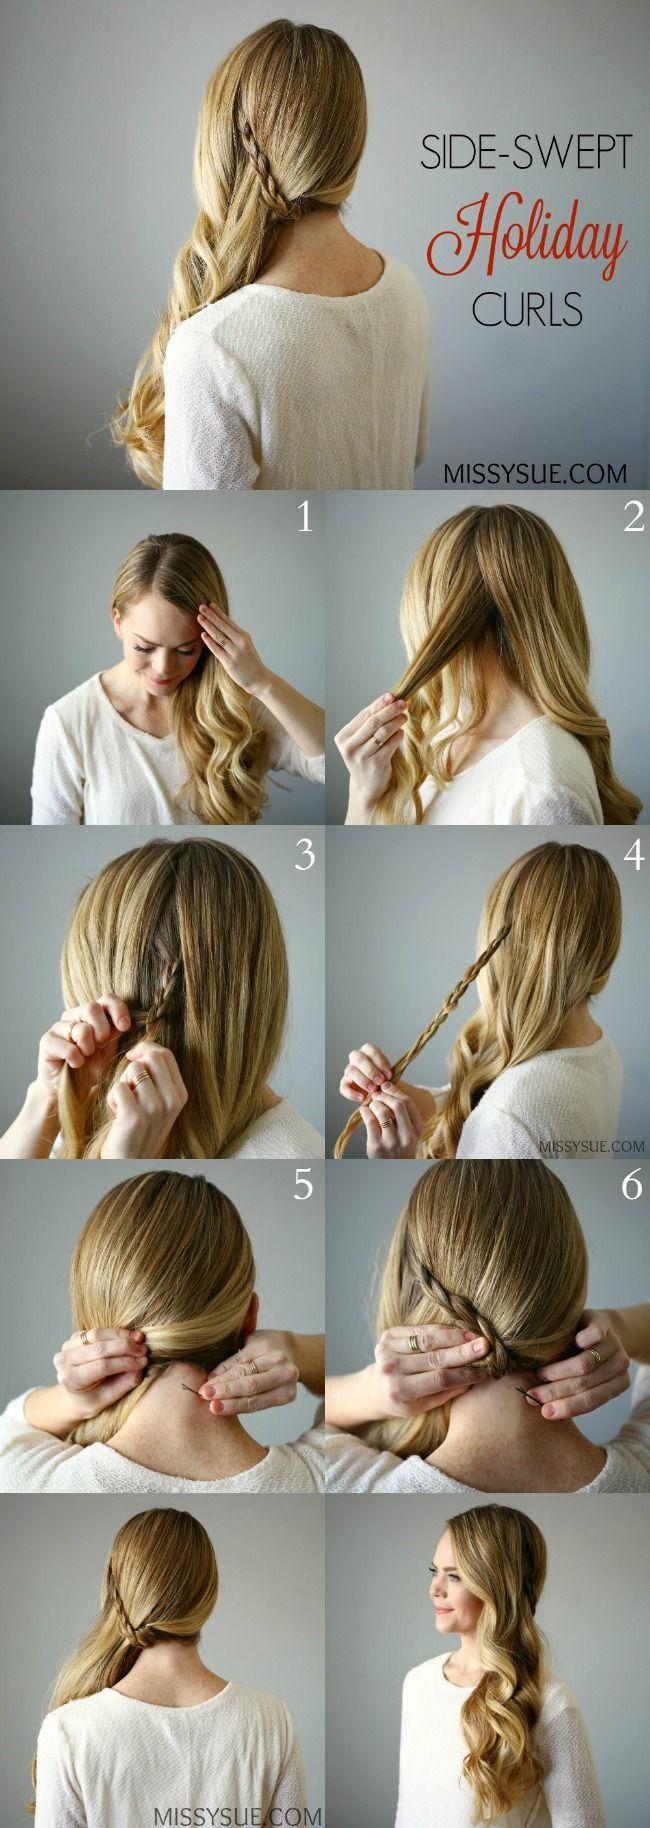 Pin by heidi quiroga on peinados pinterest hair style makeup